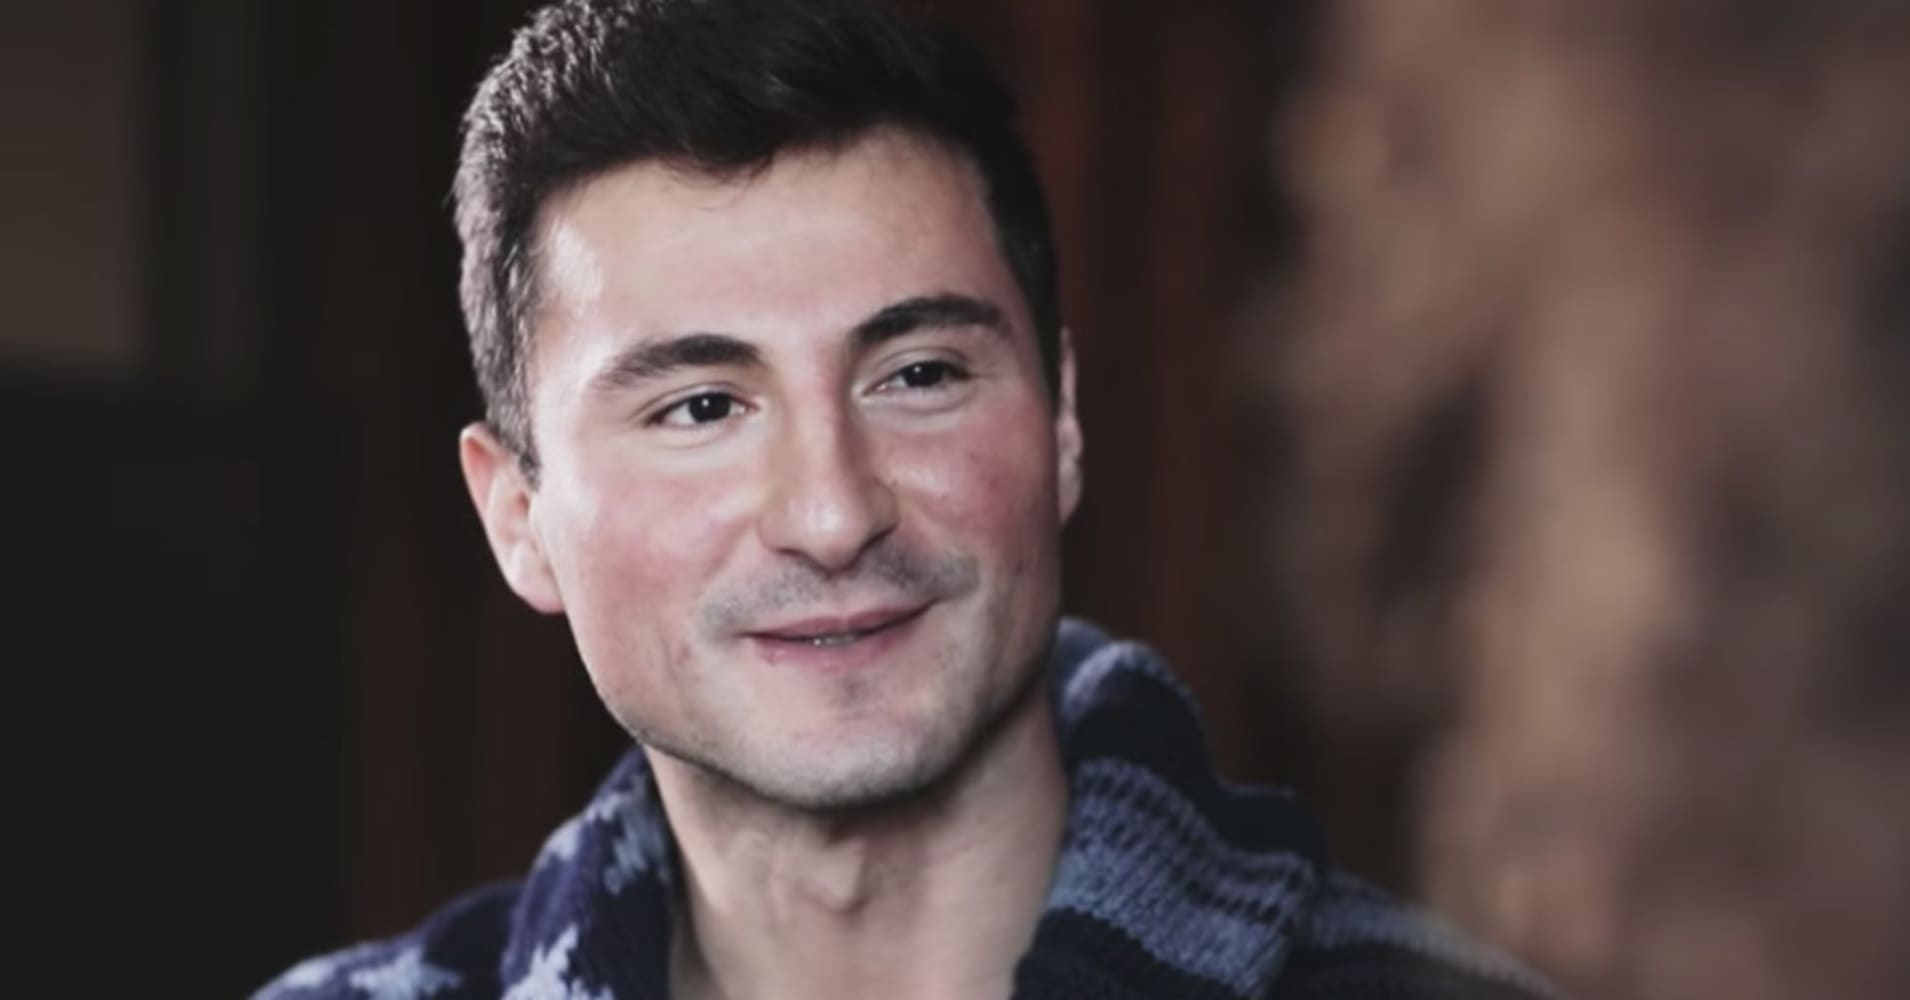 Bahtiyar Duysak, former Twitter employee.